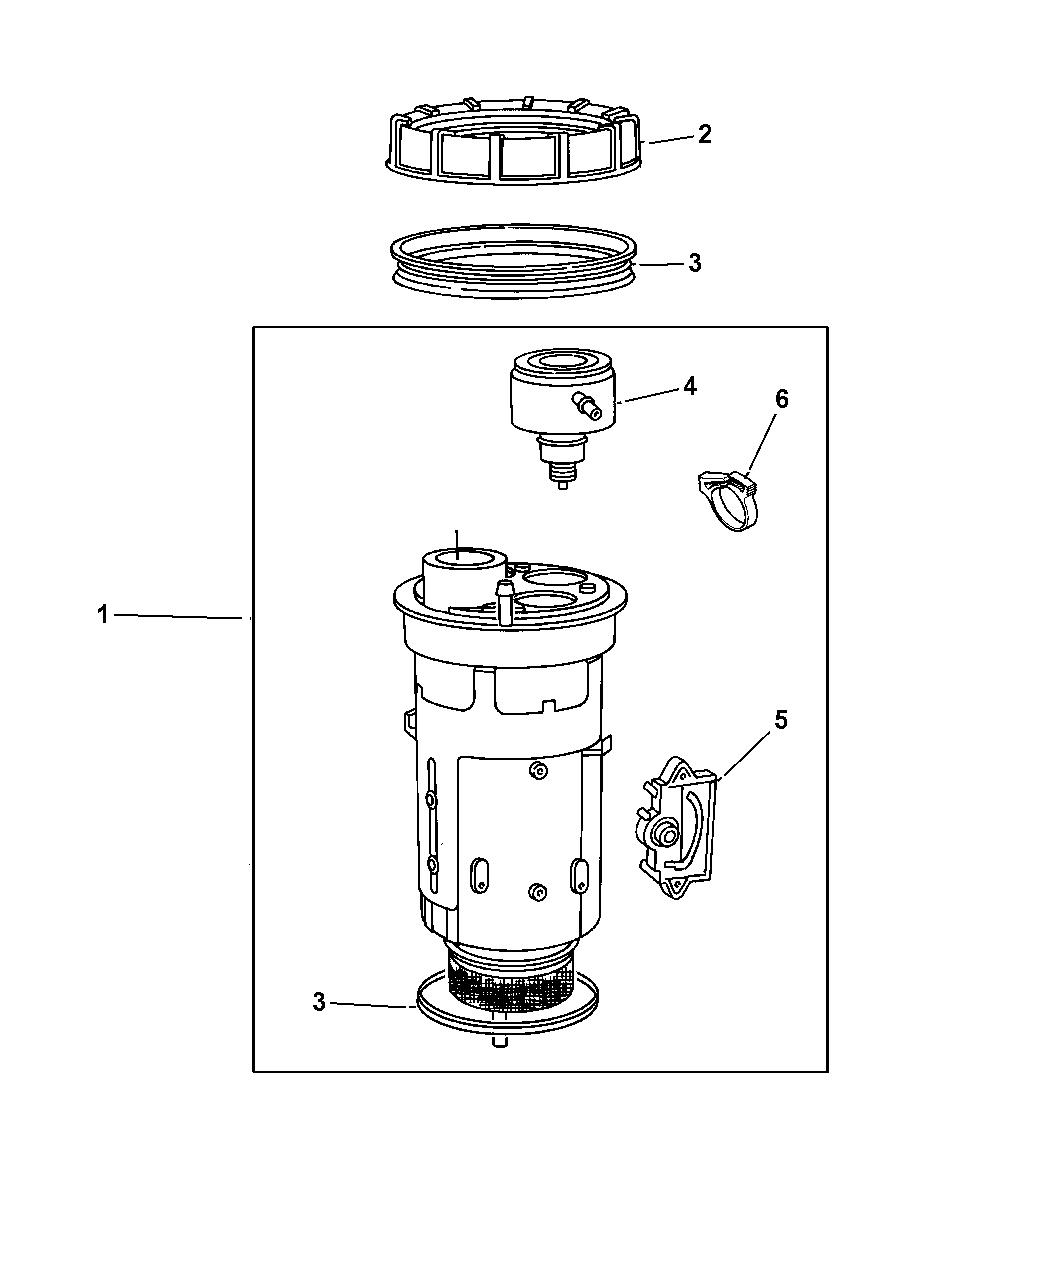 Jeep Grand Cherokee Fuel Module